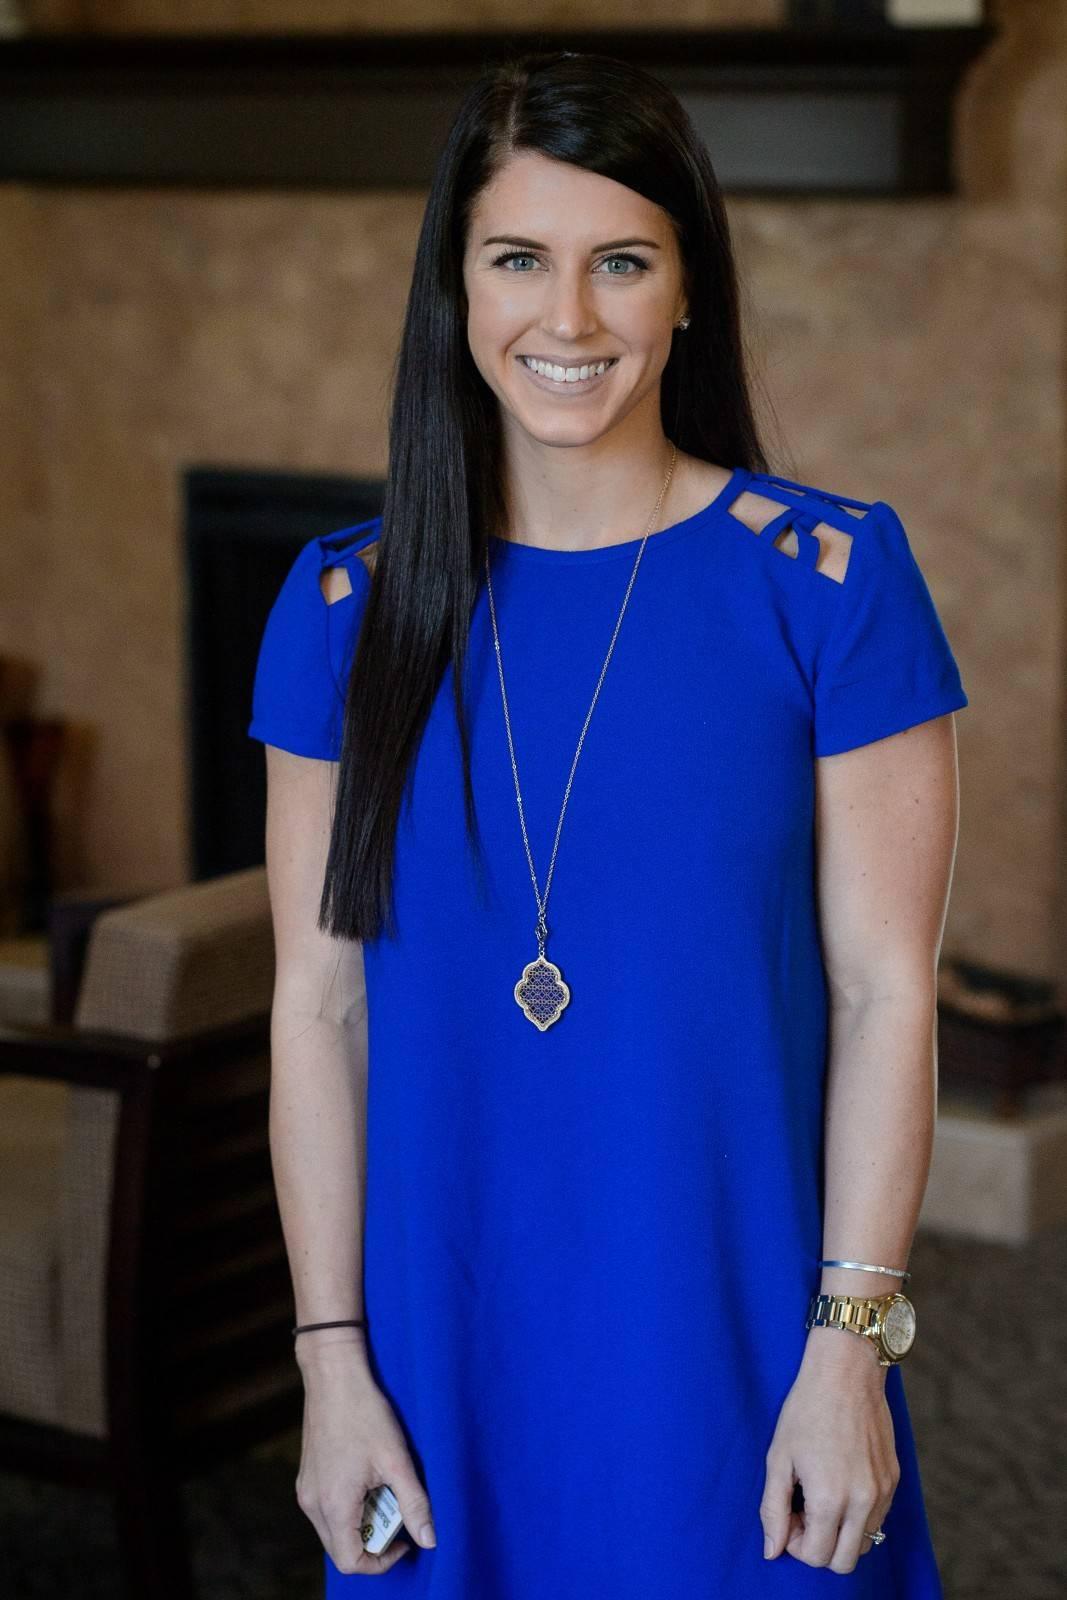 Shannon Harter